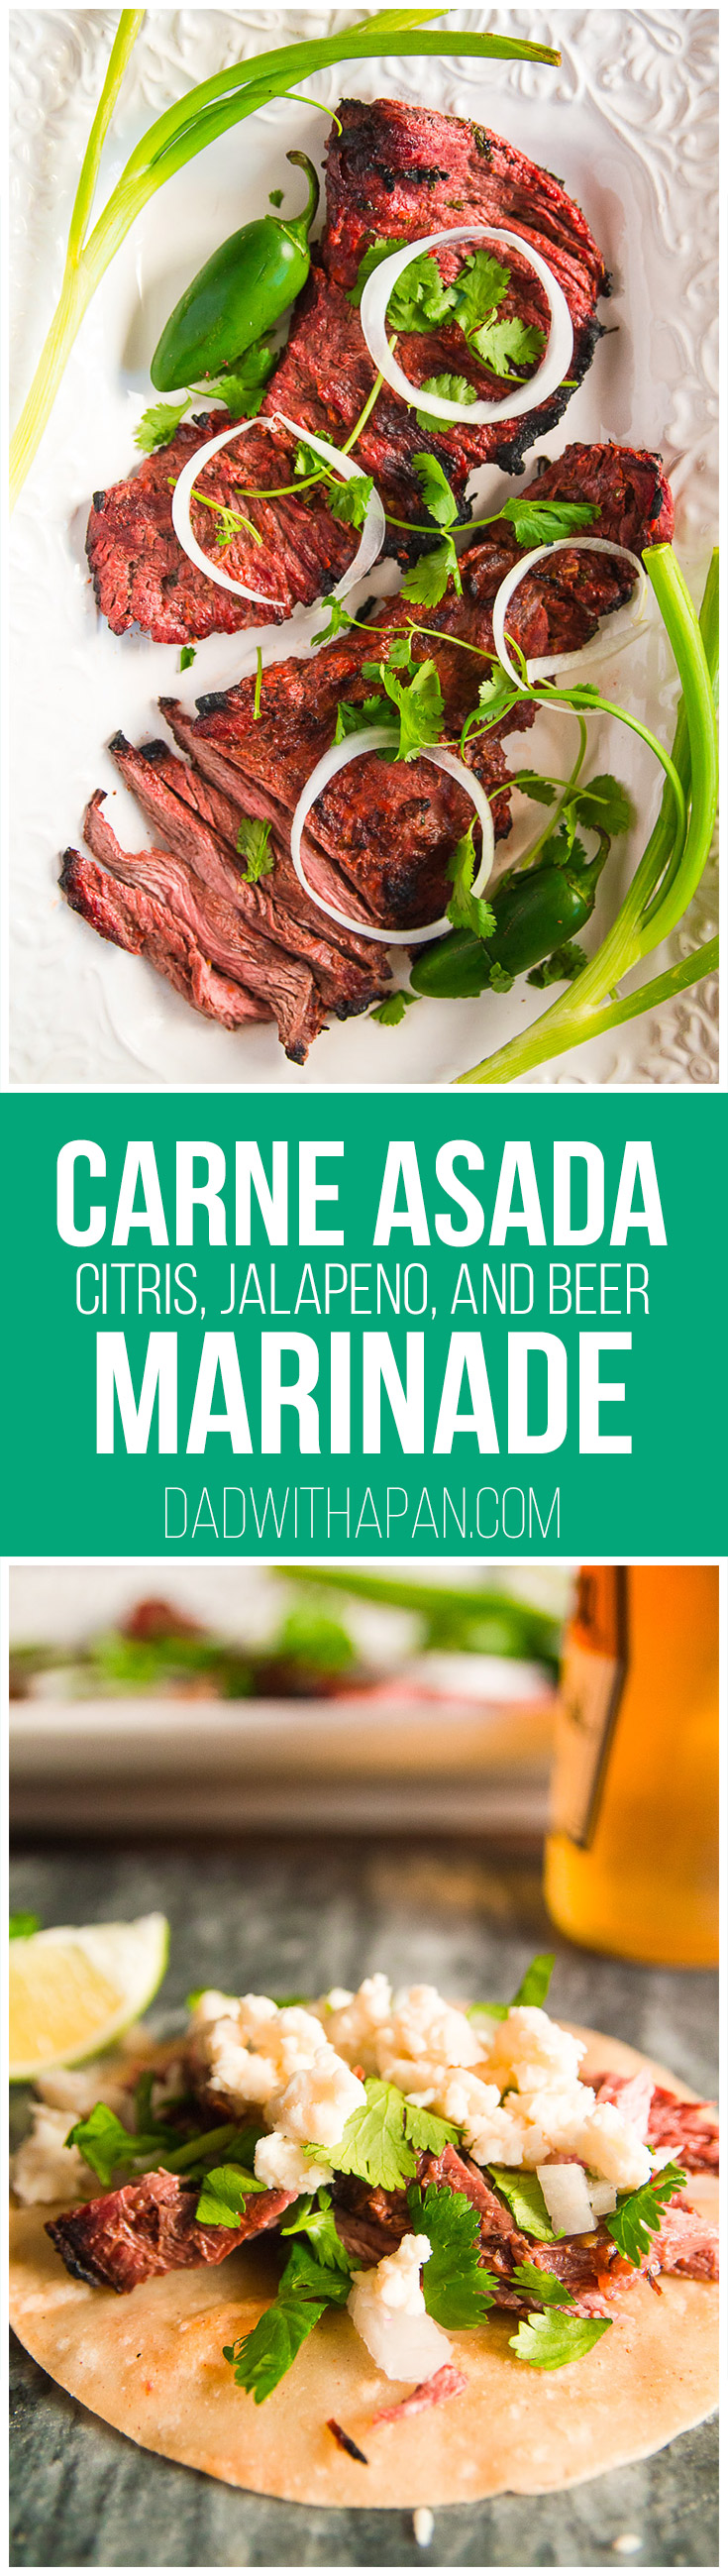 Carne Asada Beer Marinade Recipe